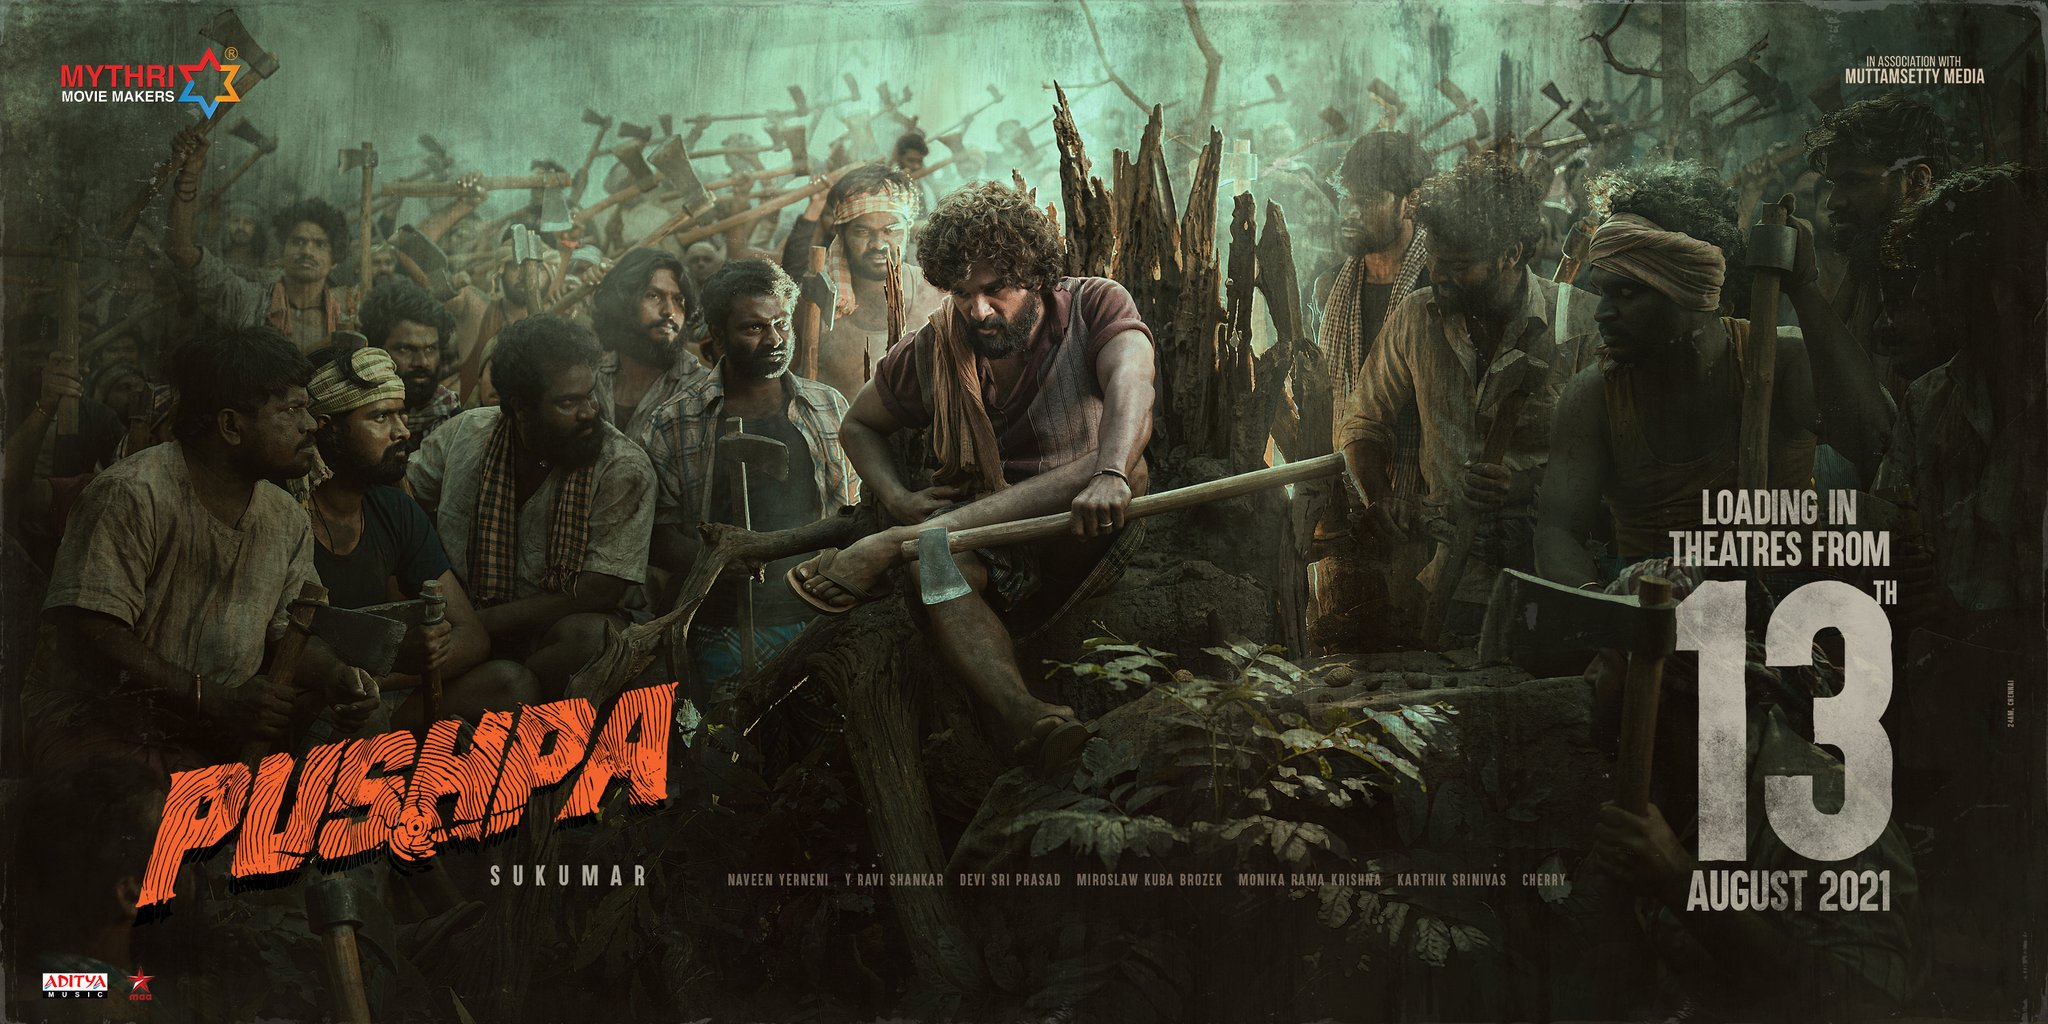 Allu Arjun Pushpa Movie Release Date on Aug 13th 2021 Poster HD